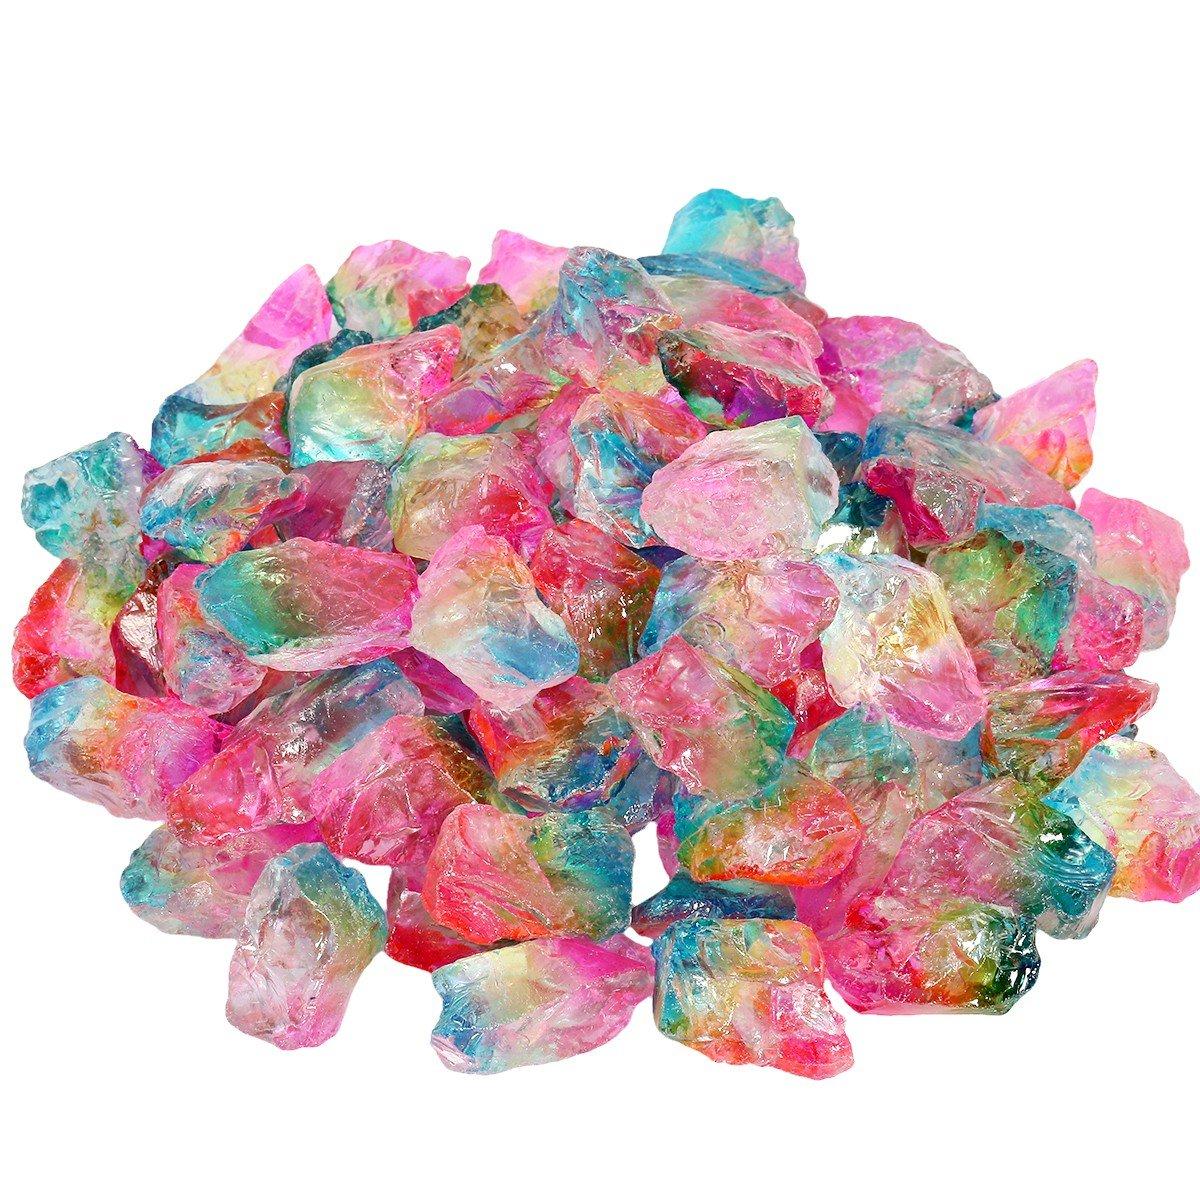 SUNYIK Rainbow Titanium Coated Rough Crystal Point Raw Rock Quartz Cluster Specimen 0.5lb (0.5''-2'') by SUNYIK